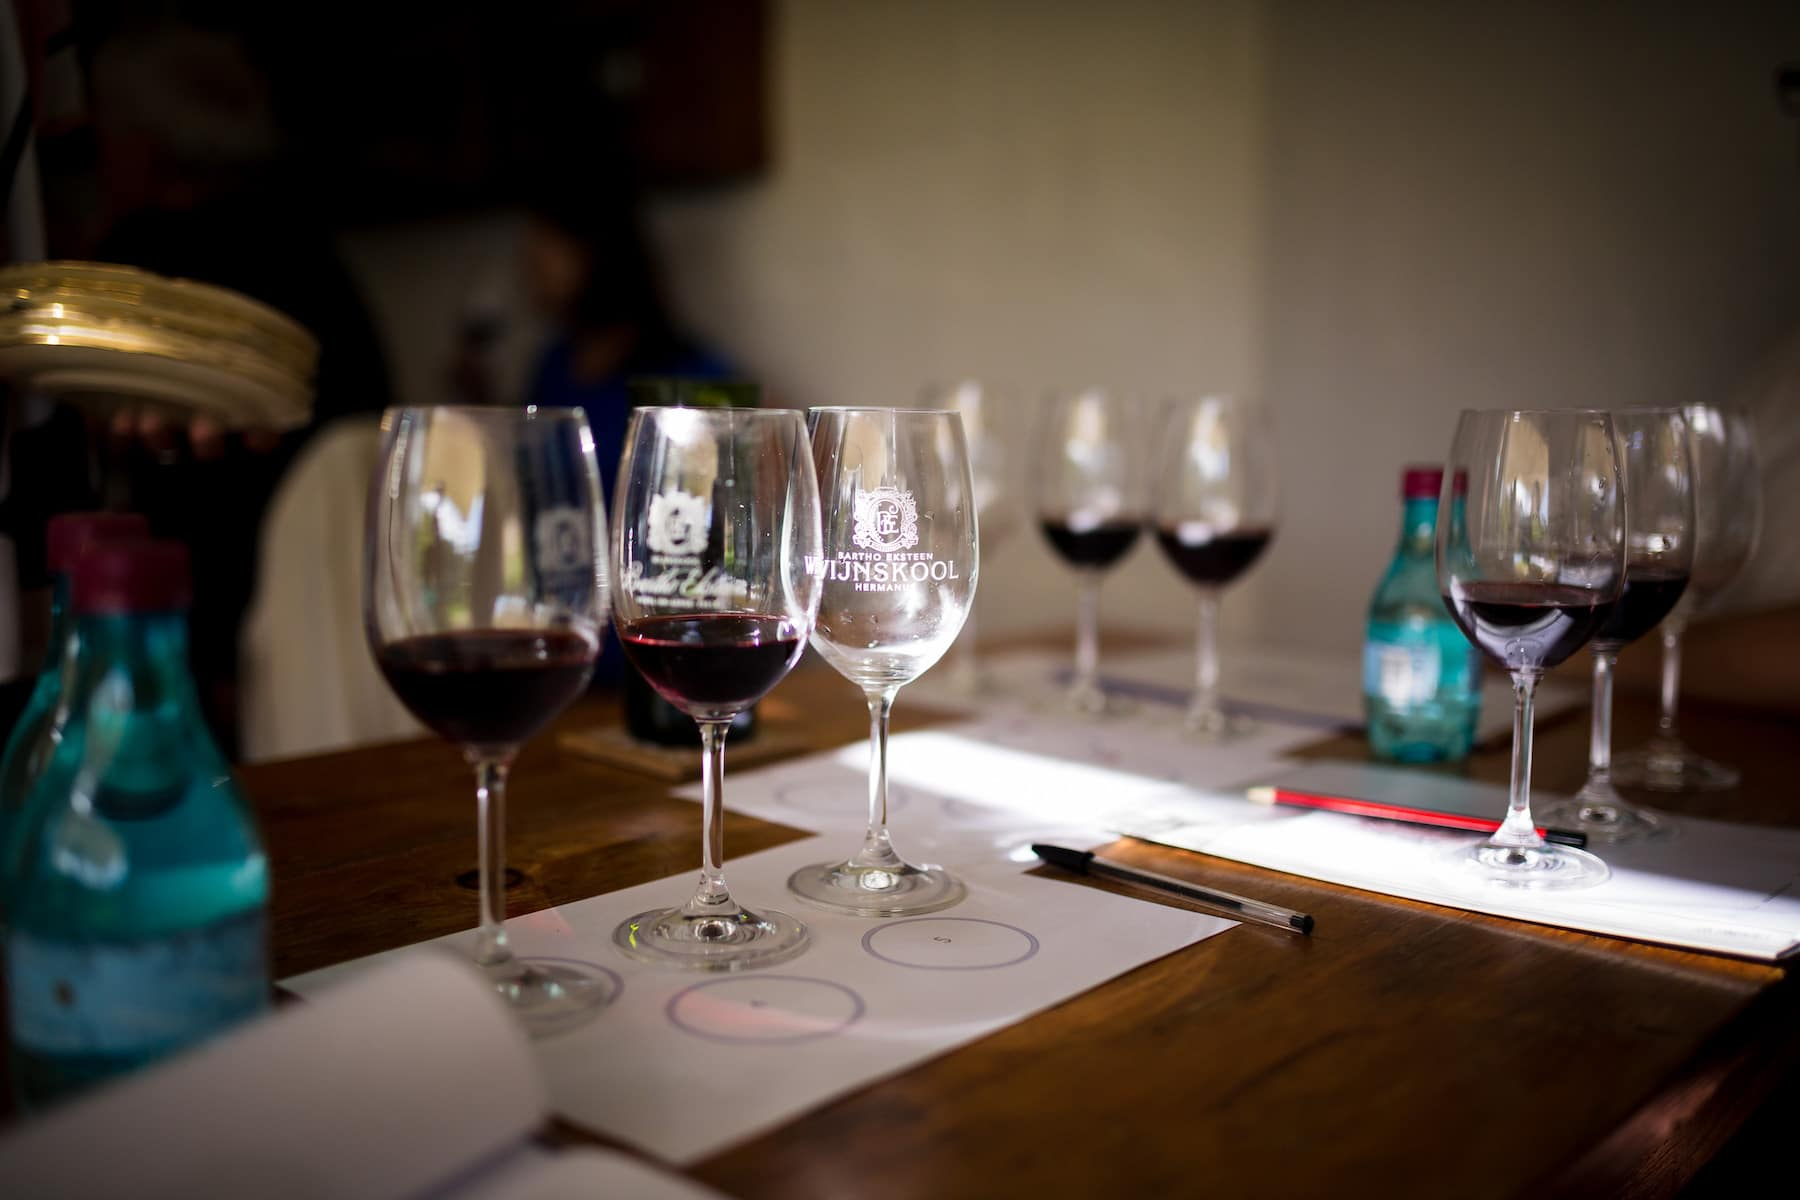 Wijnskool wines